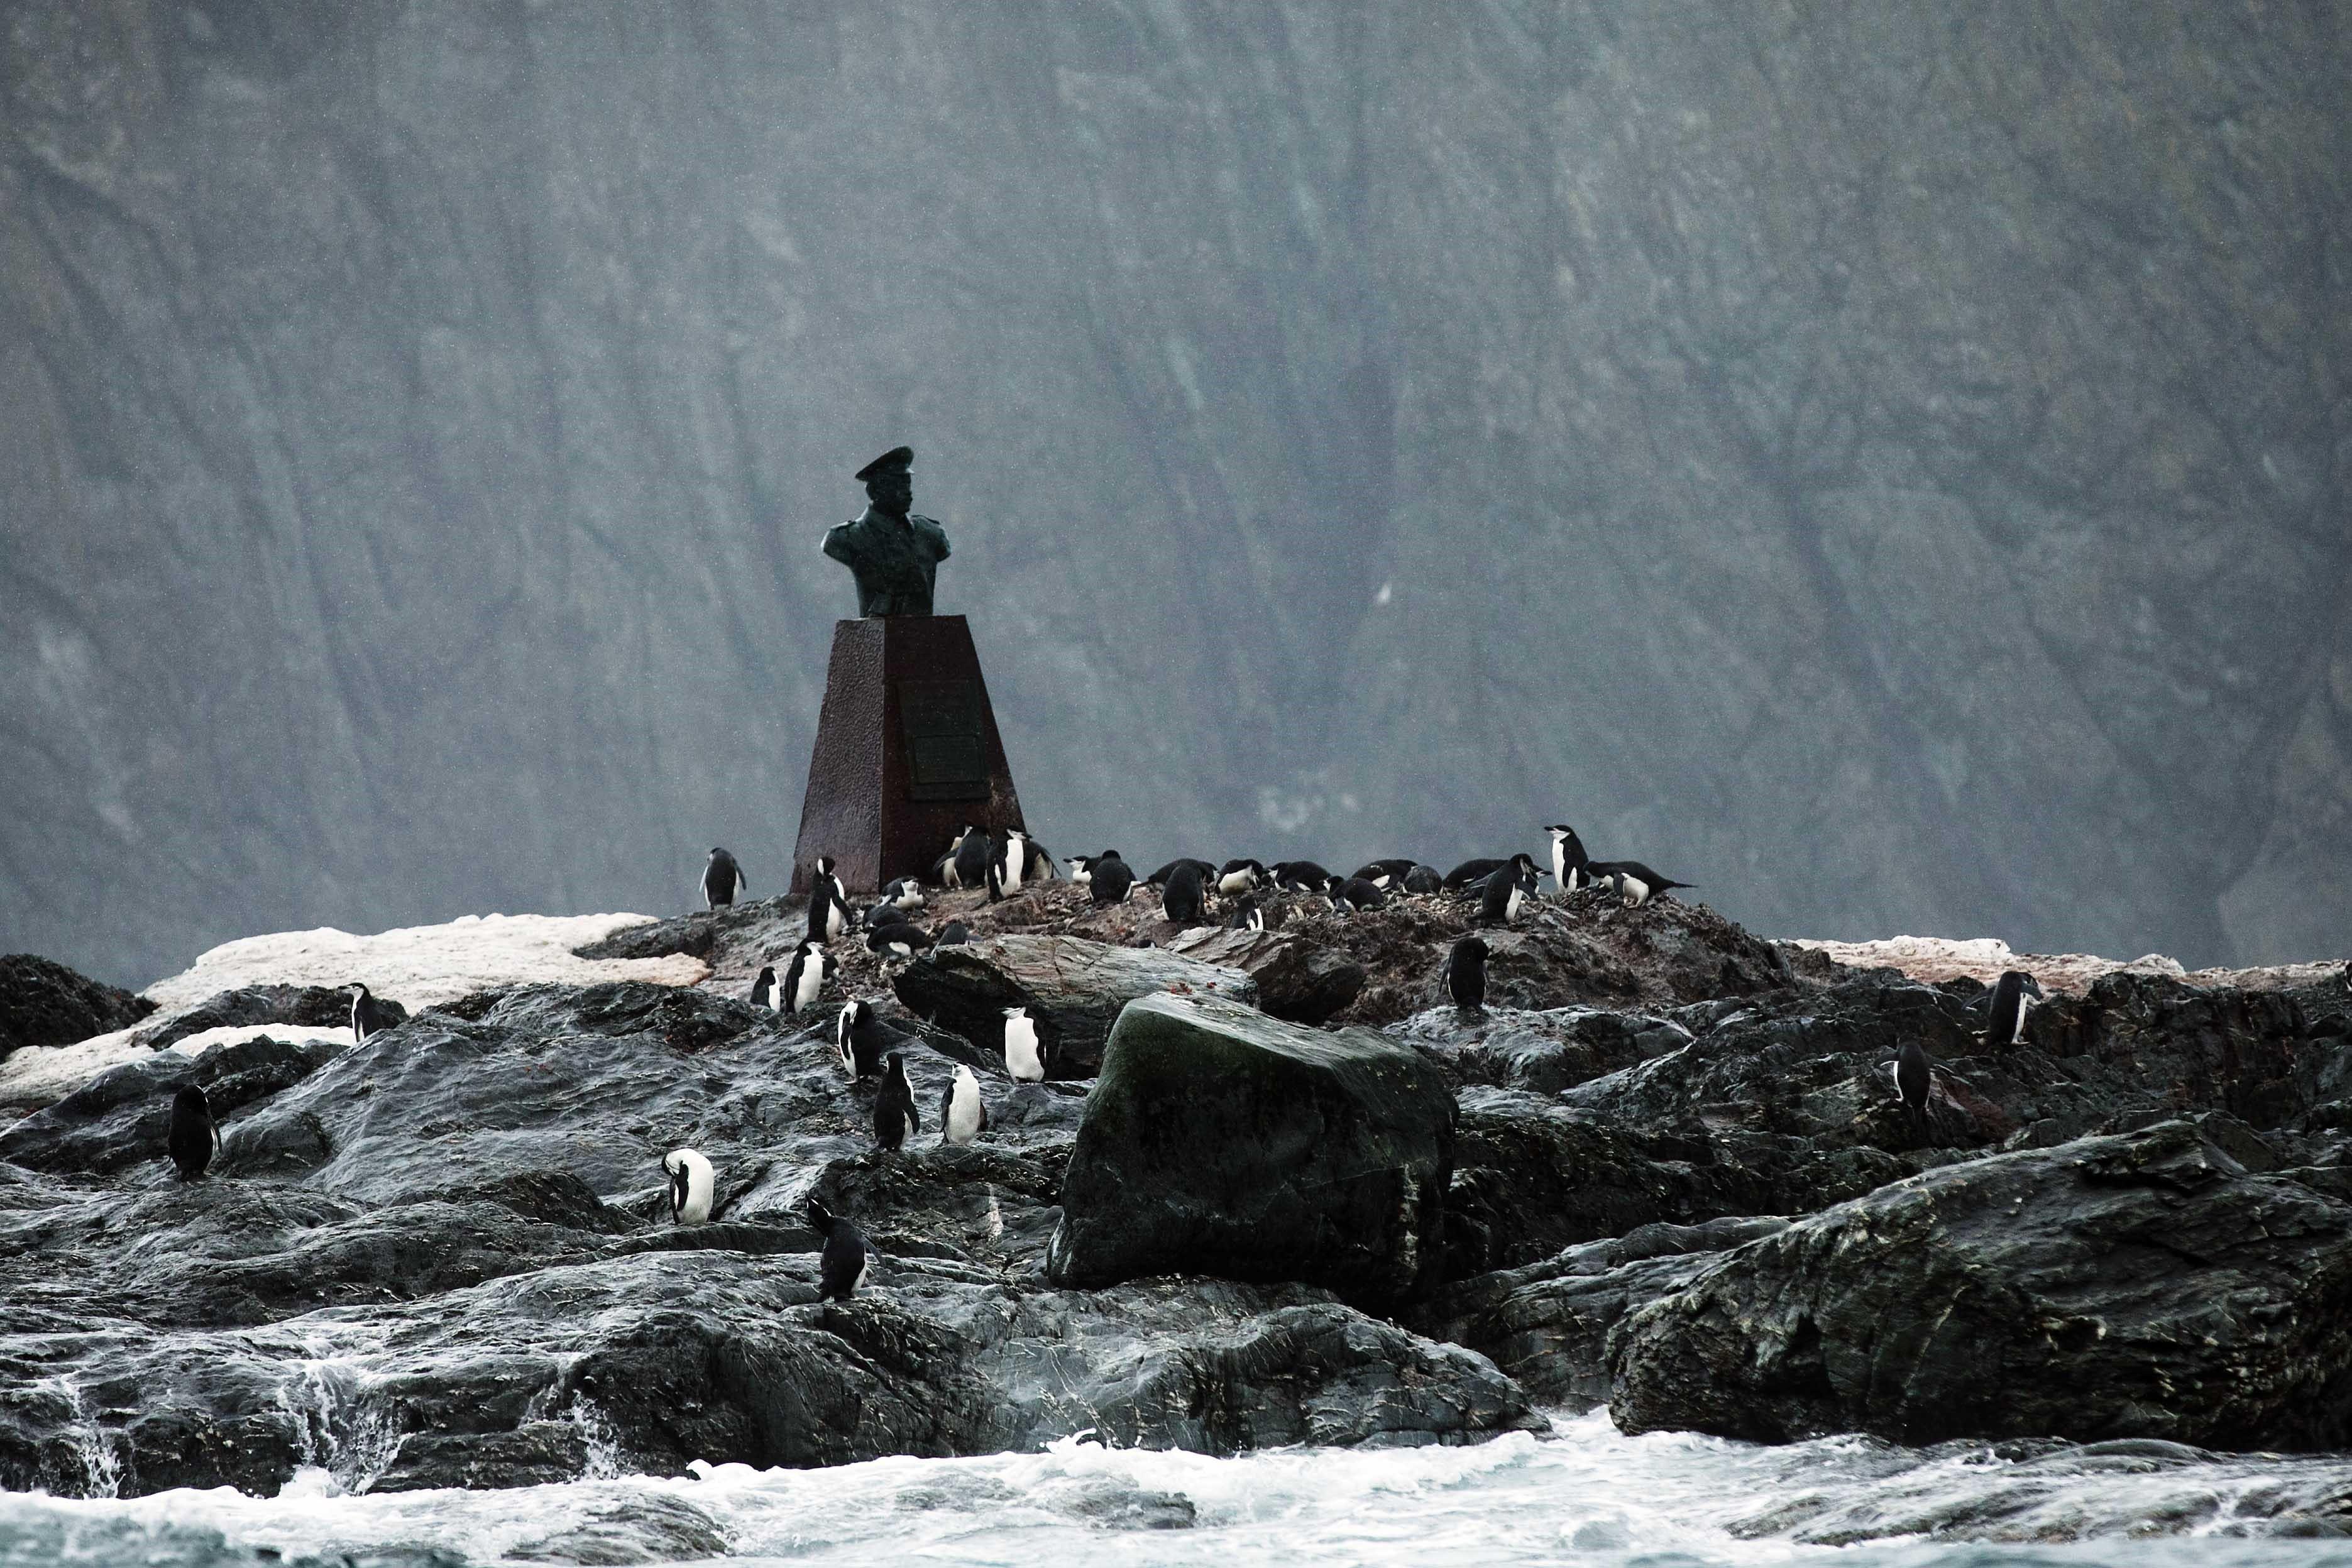 Statue of Captain Luis Alberto Pardo Villalón, Point Wild, Elephant Island